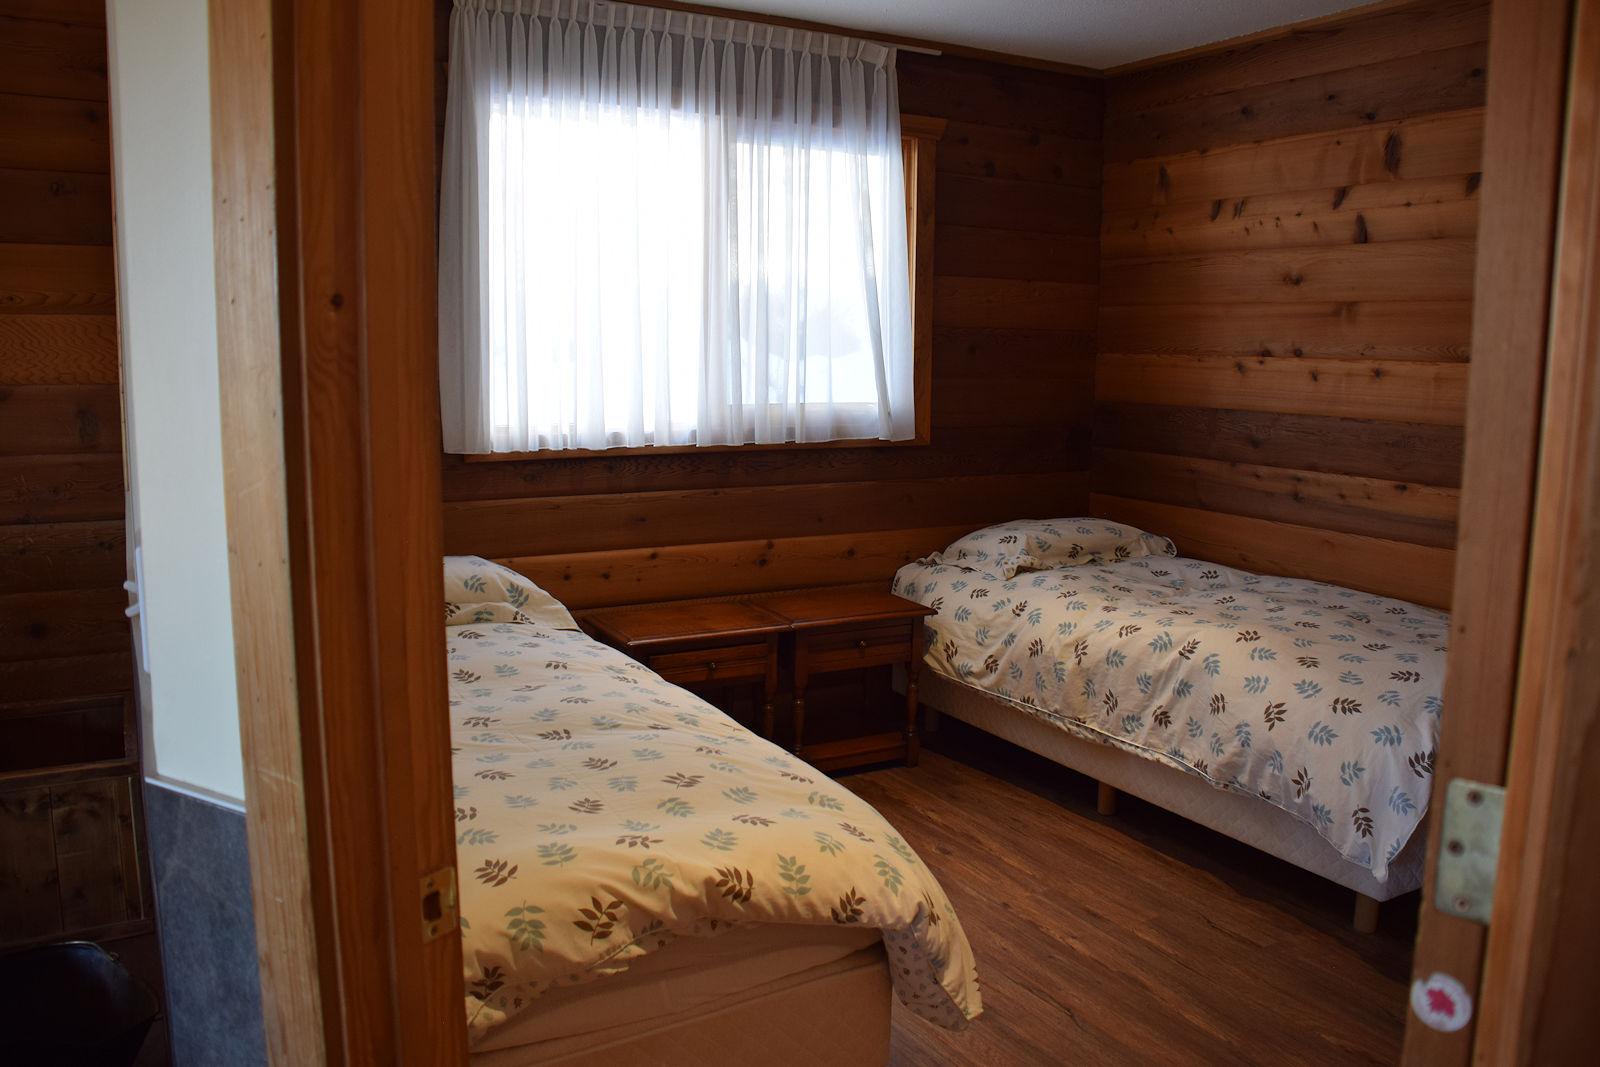 https://0901.nccdn.net/4_2/000/000/04d/fc0/the_elk_bedroom.jpg